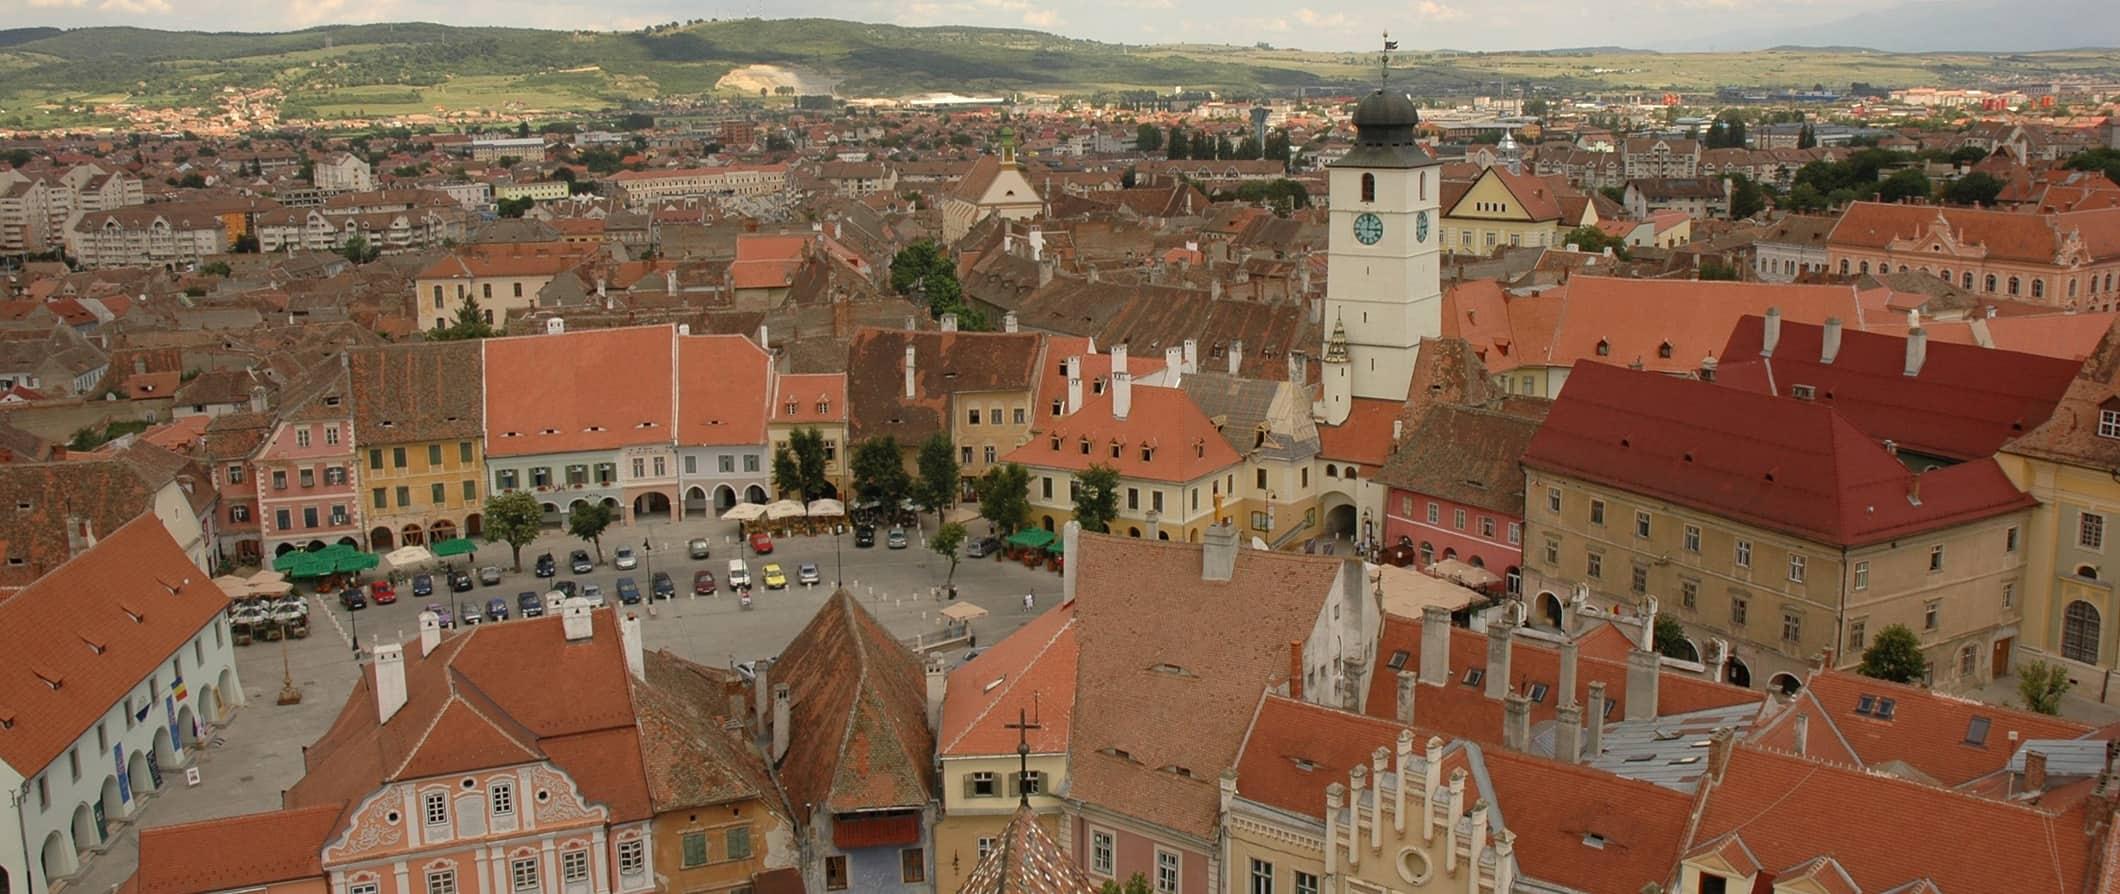 the Old Town in Sibiu